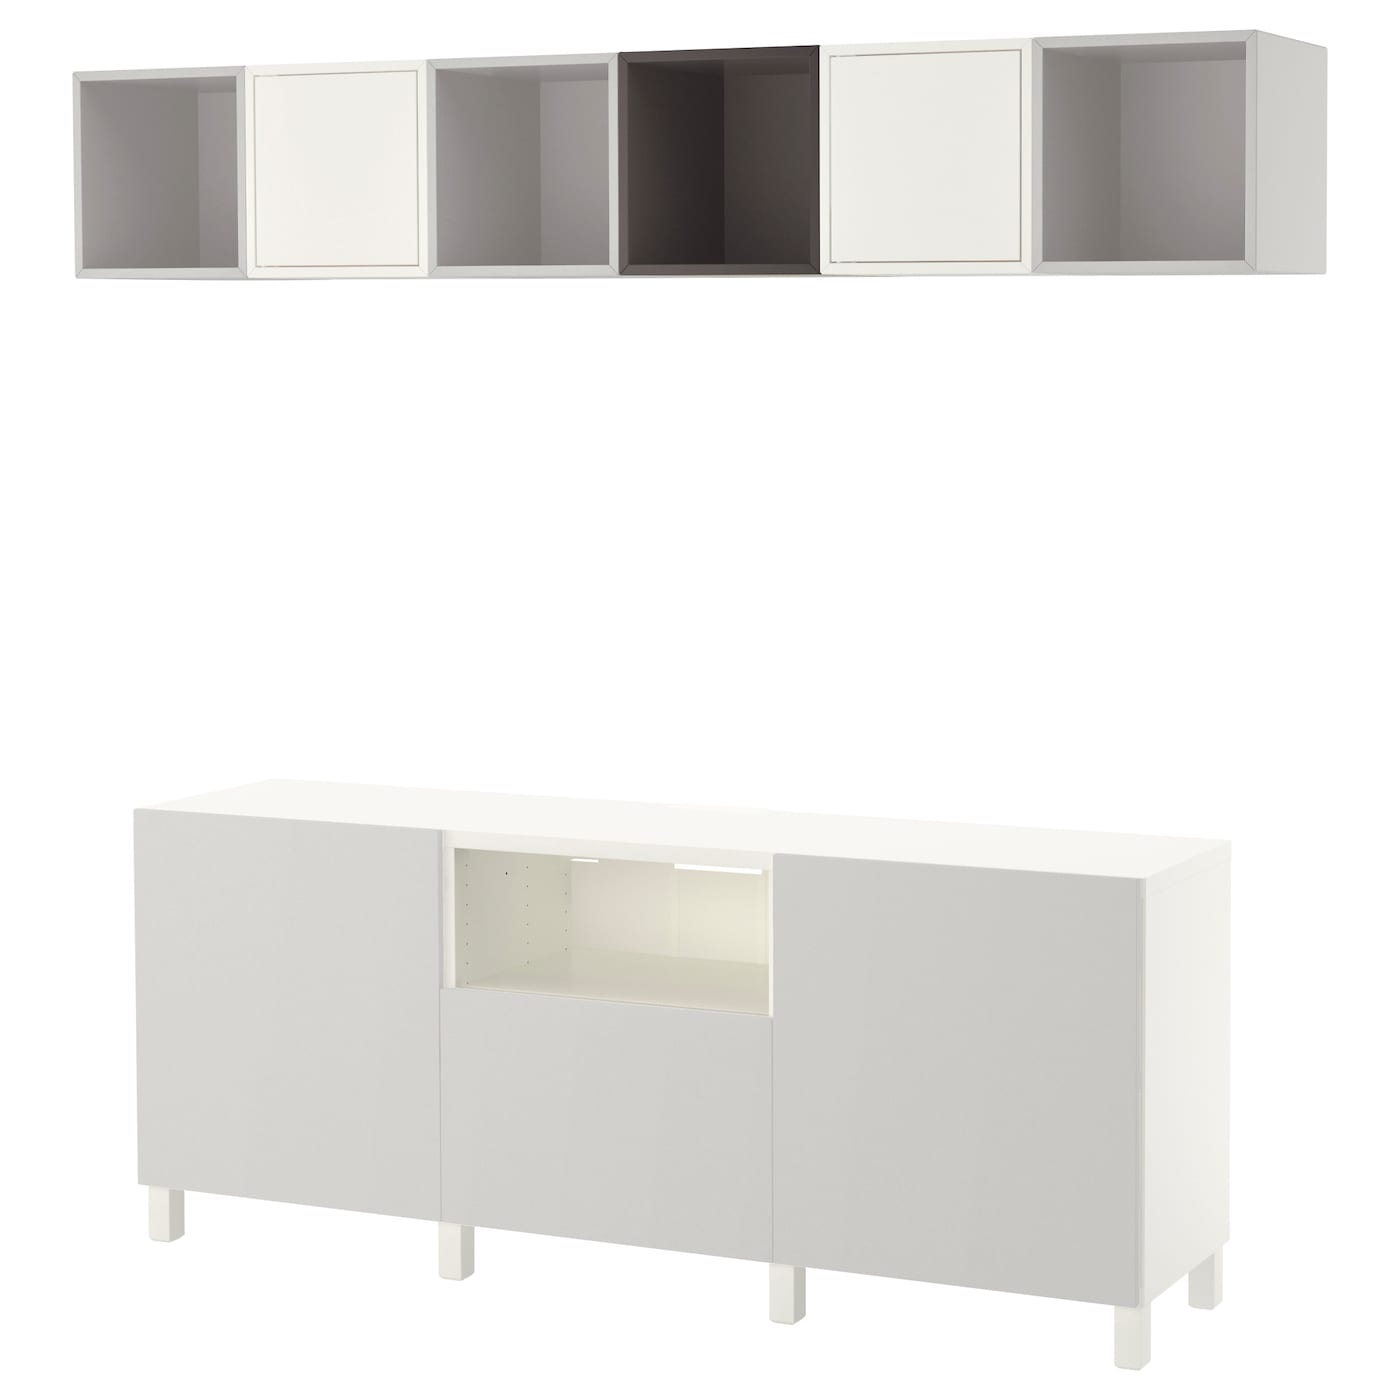 eket best cabinet combination for tv white dark grey light grey 210x40x220 cm ikea. Black Bedroom Furniture Sets. Home Design Ideas